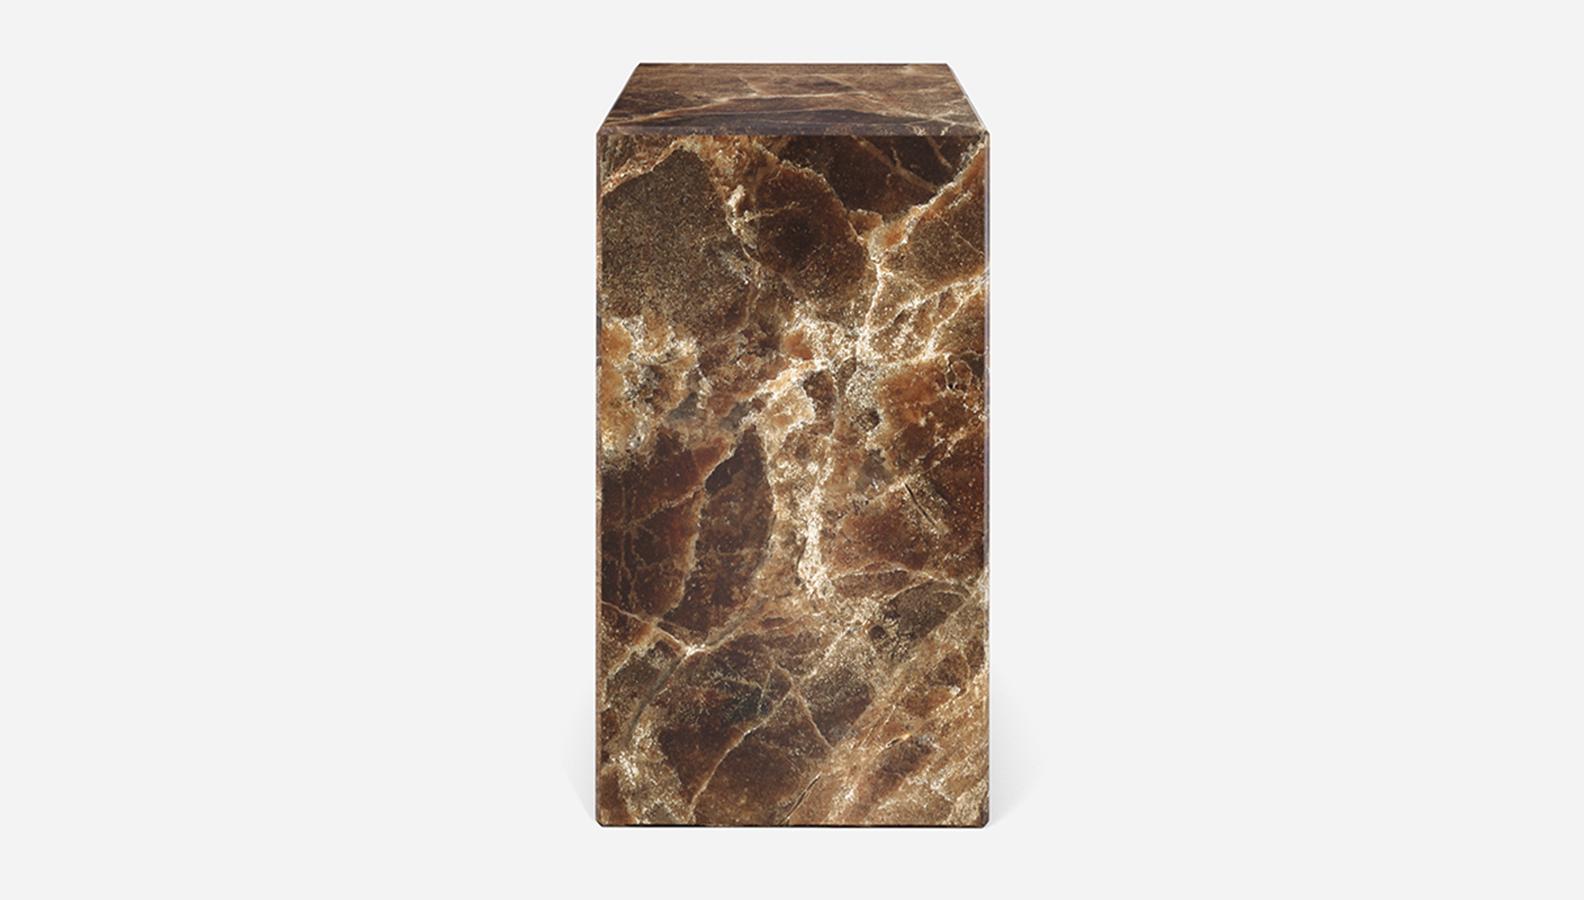 Aime Té Marmerblok Pilaar - Dark Emperador Bruin - 30  x 30  x 51